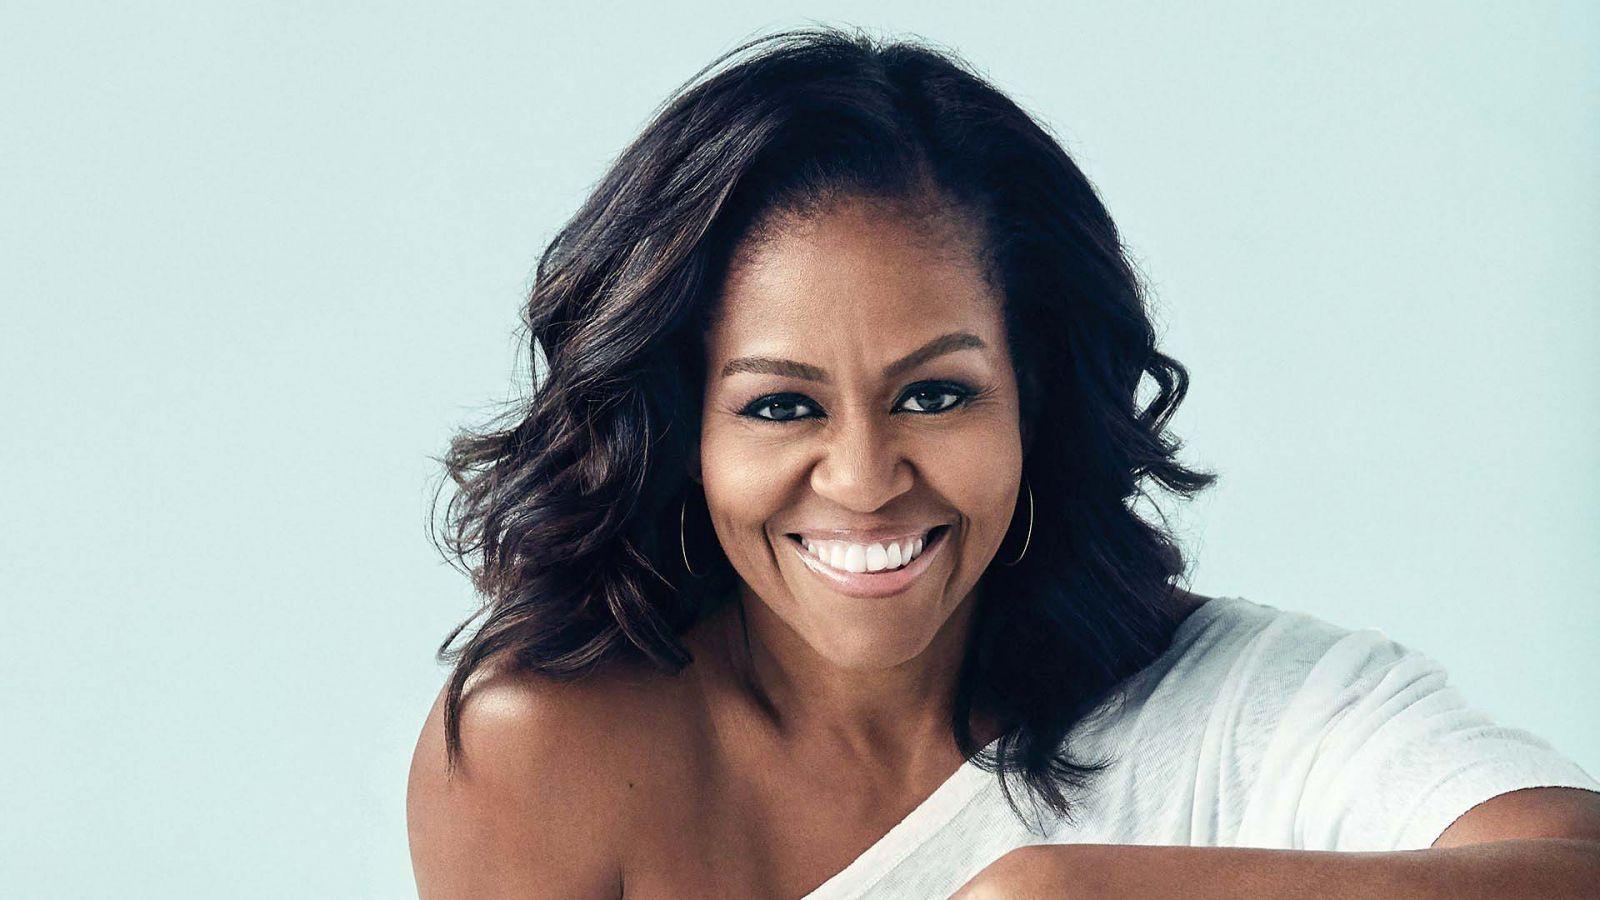 Michelle Obama: Δείτε ποιο χόμπι ξεκίνησε στη διάρκεια της καραντίνας [vid]